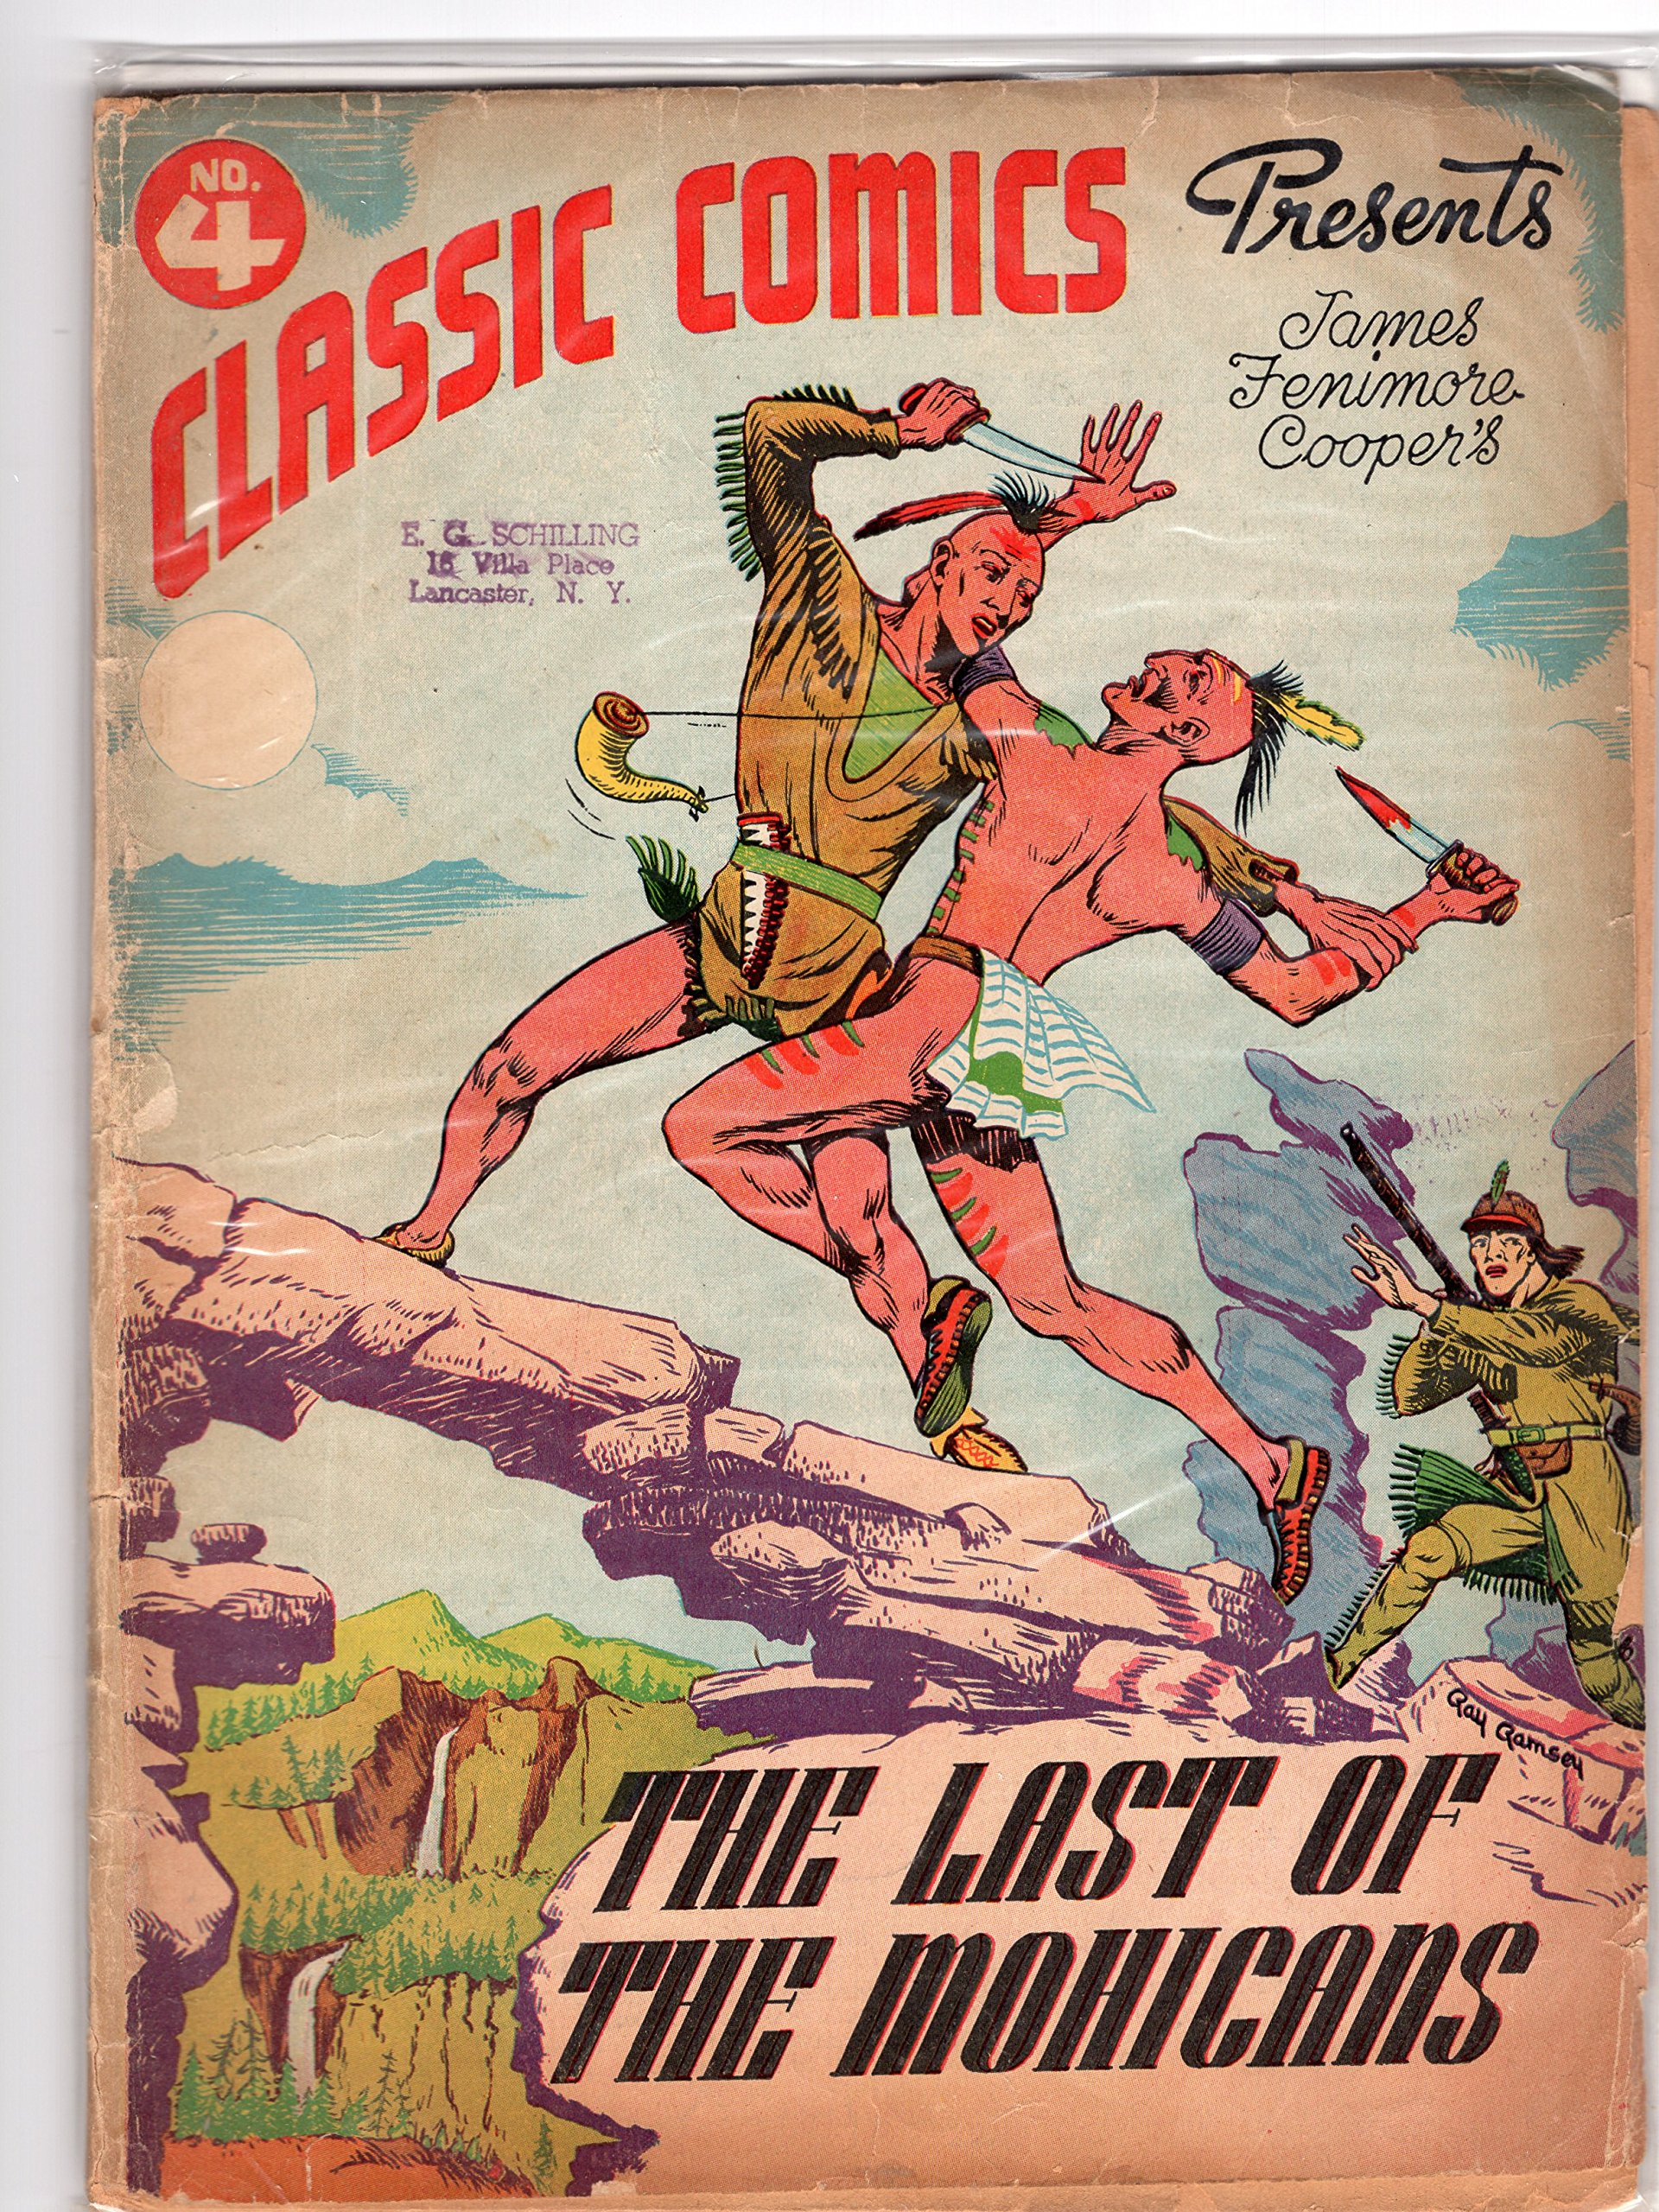 Amazon.com: The Last of the Mohicans (Classic Comics, Volume ...